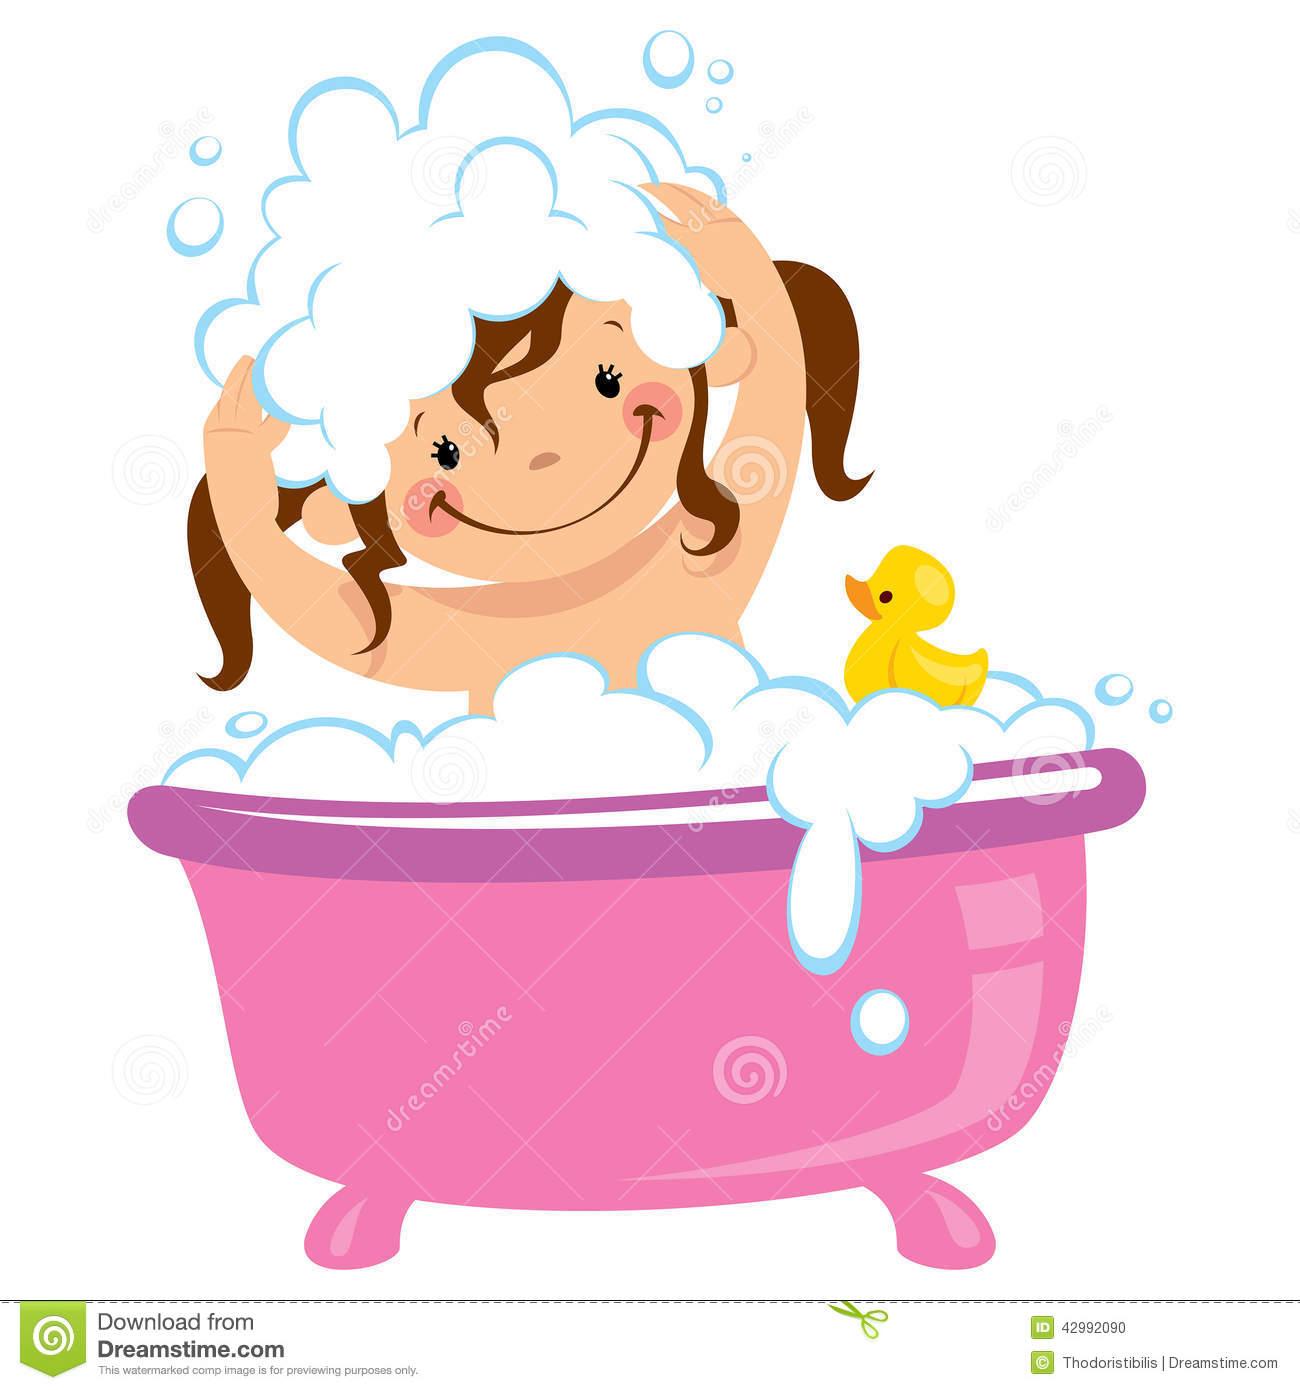 Clipart boy washing hair graphic transparent stock Animated Washing Your Hair Clipart - Clipart Kid graphic transparent stock